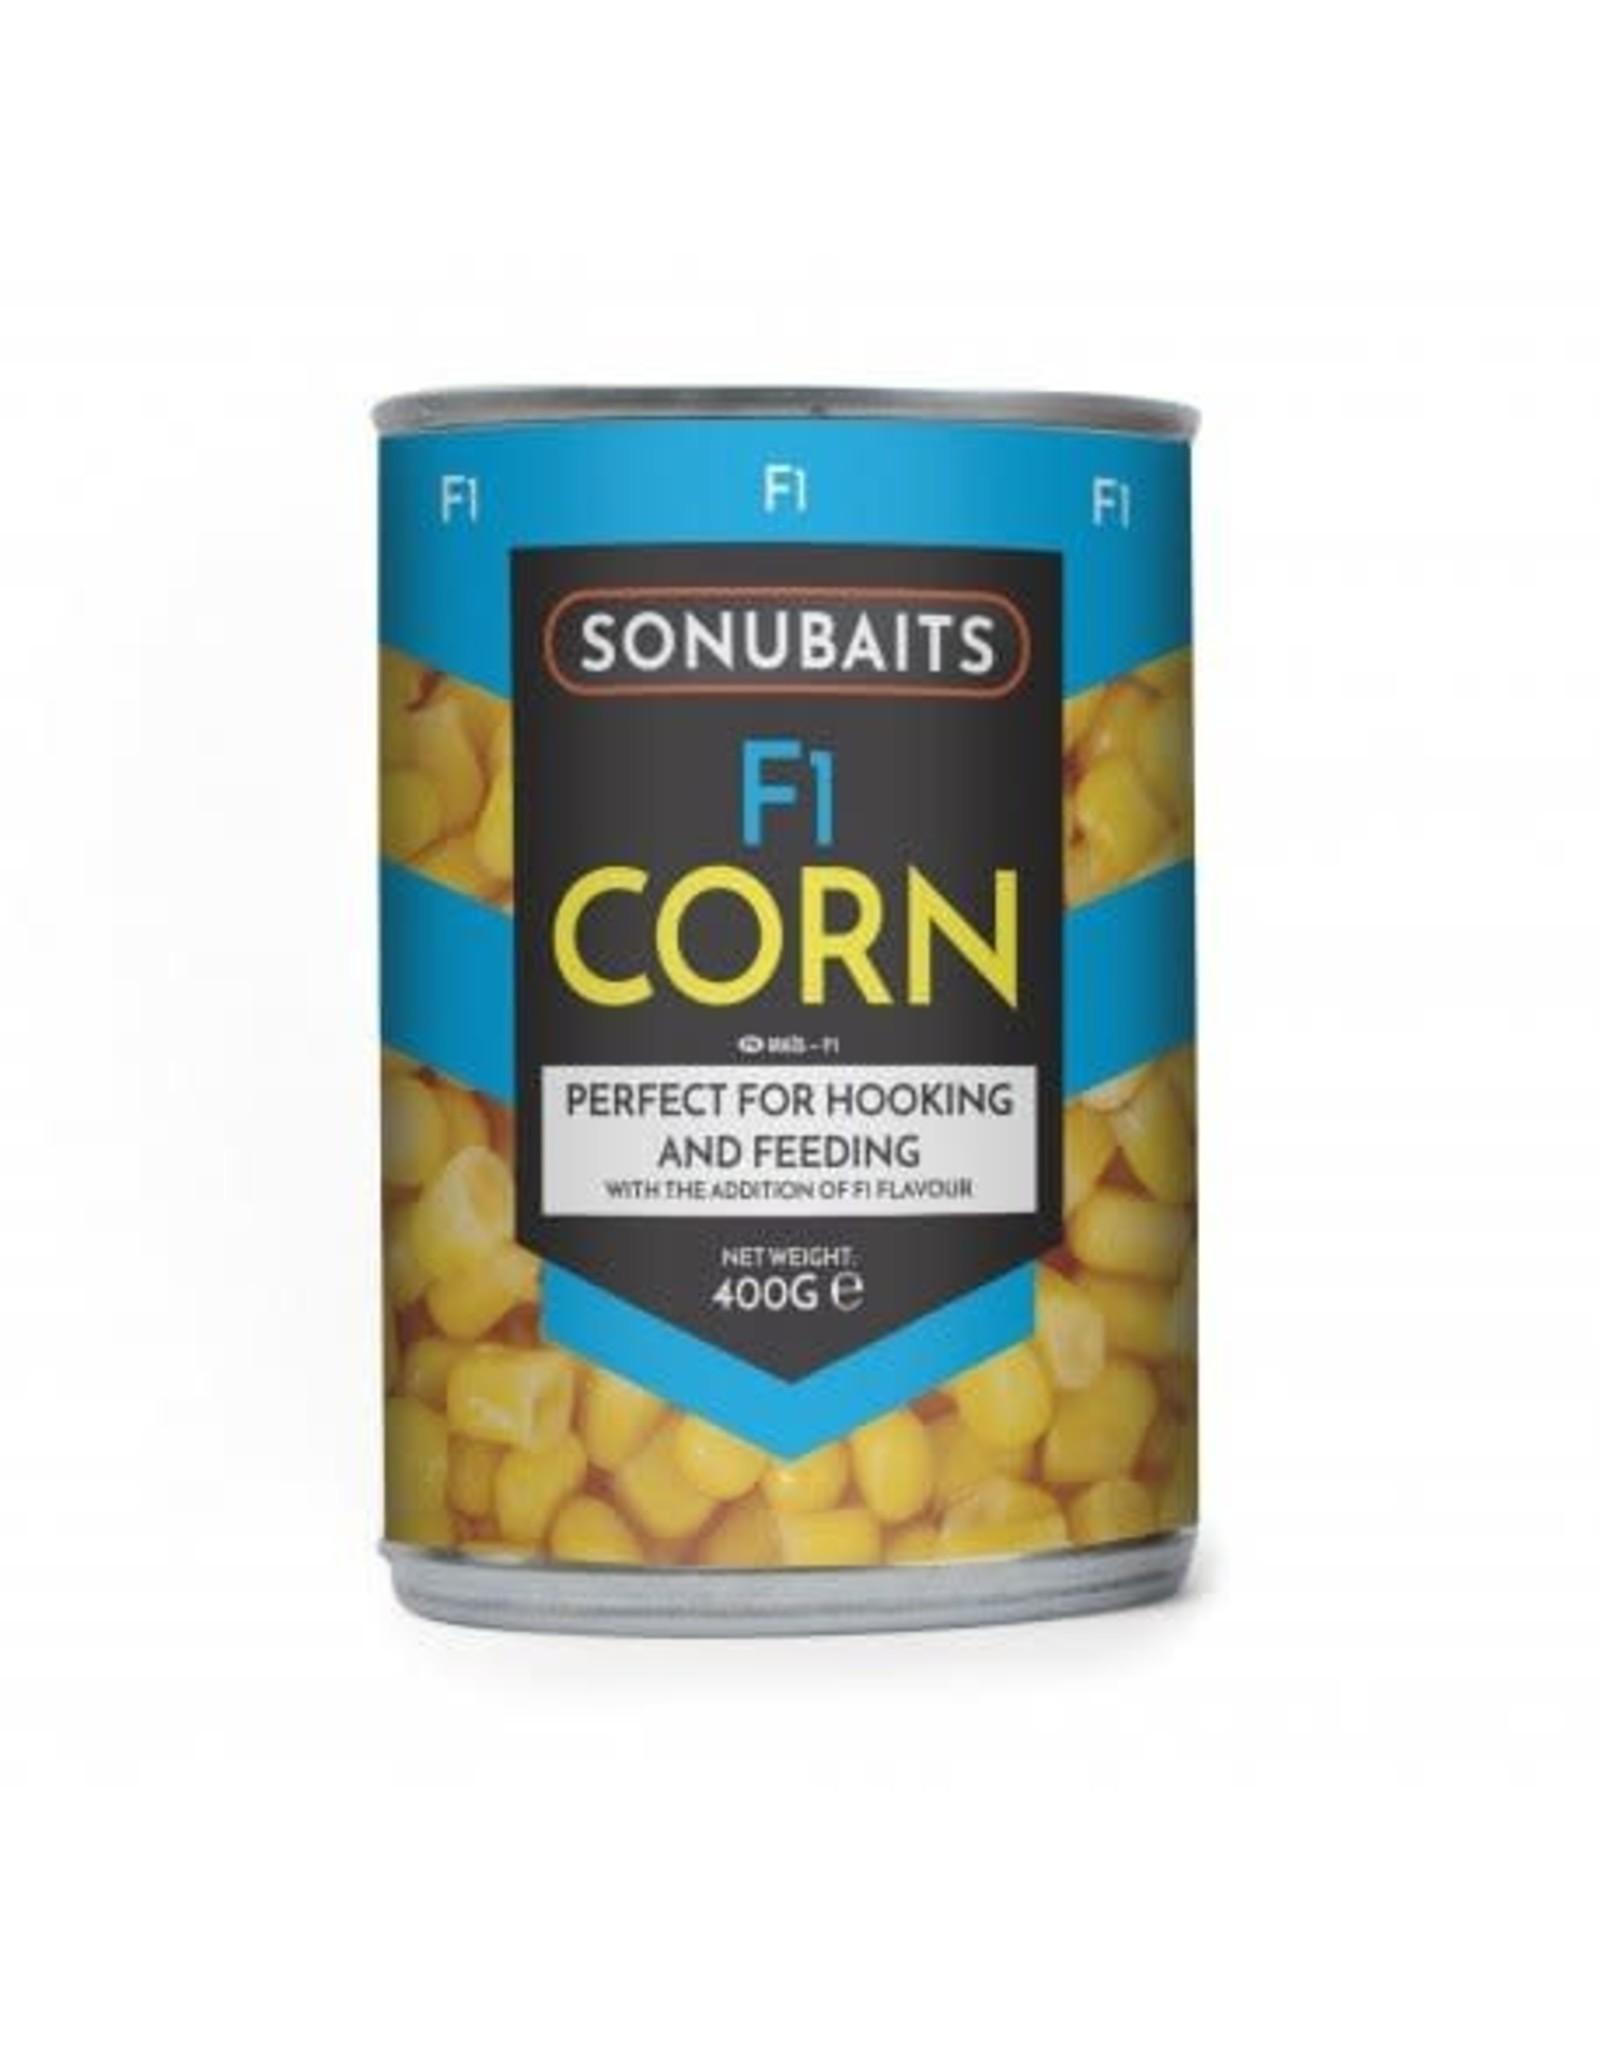 SONUBAITS F1 Corn